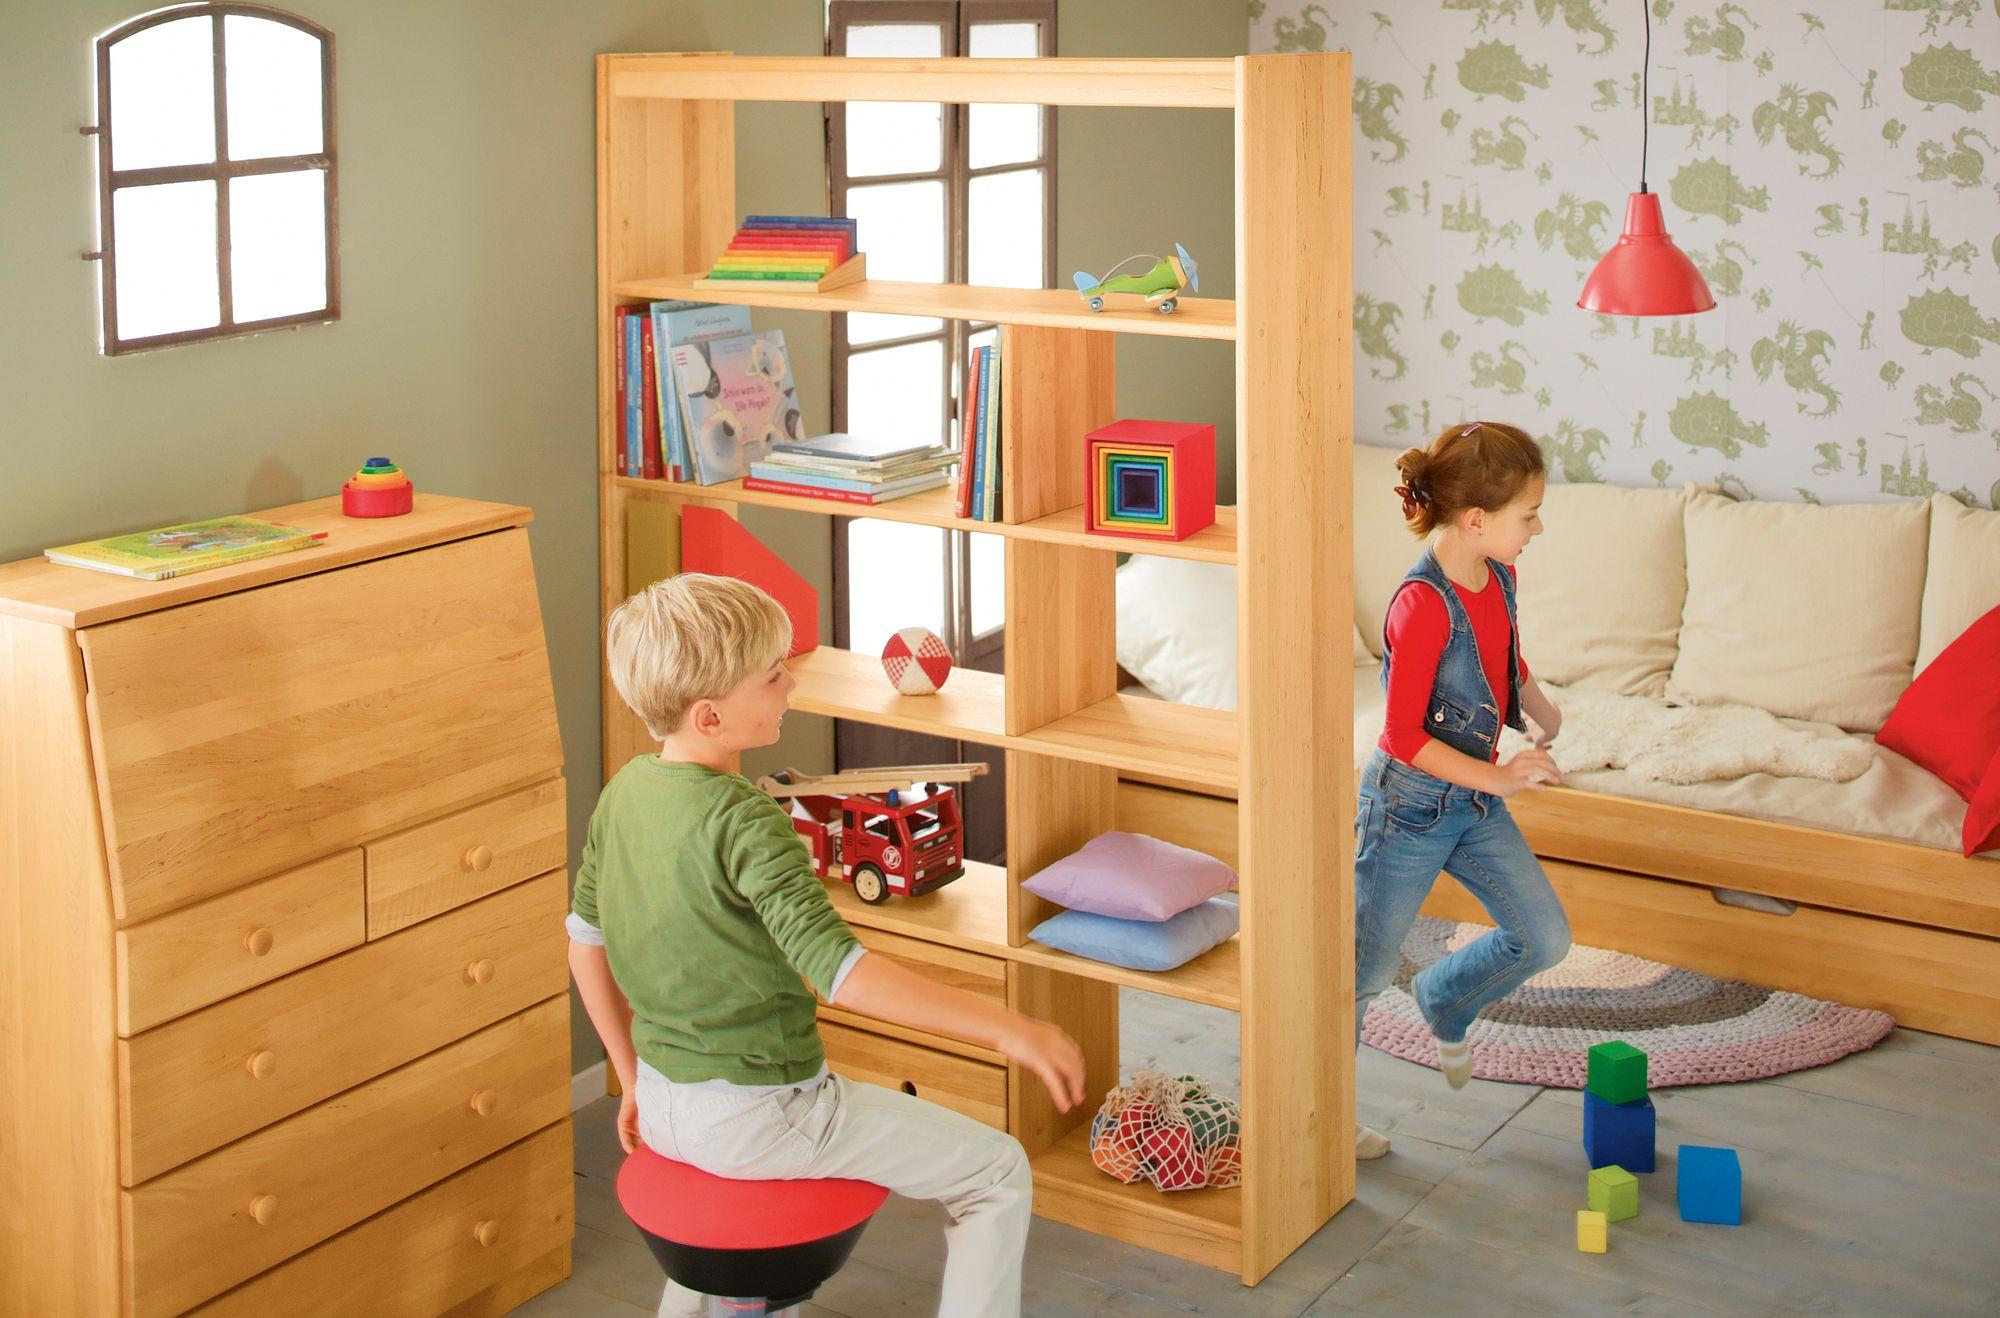 Full Size of Raumteiler Kinderzimmer Biolara Und Regal Regale Weiß Sofa Kinderzimmer Raumteiler Kinderzimmer